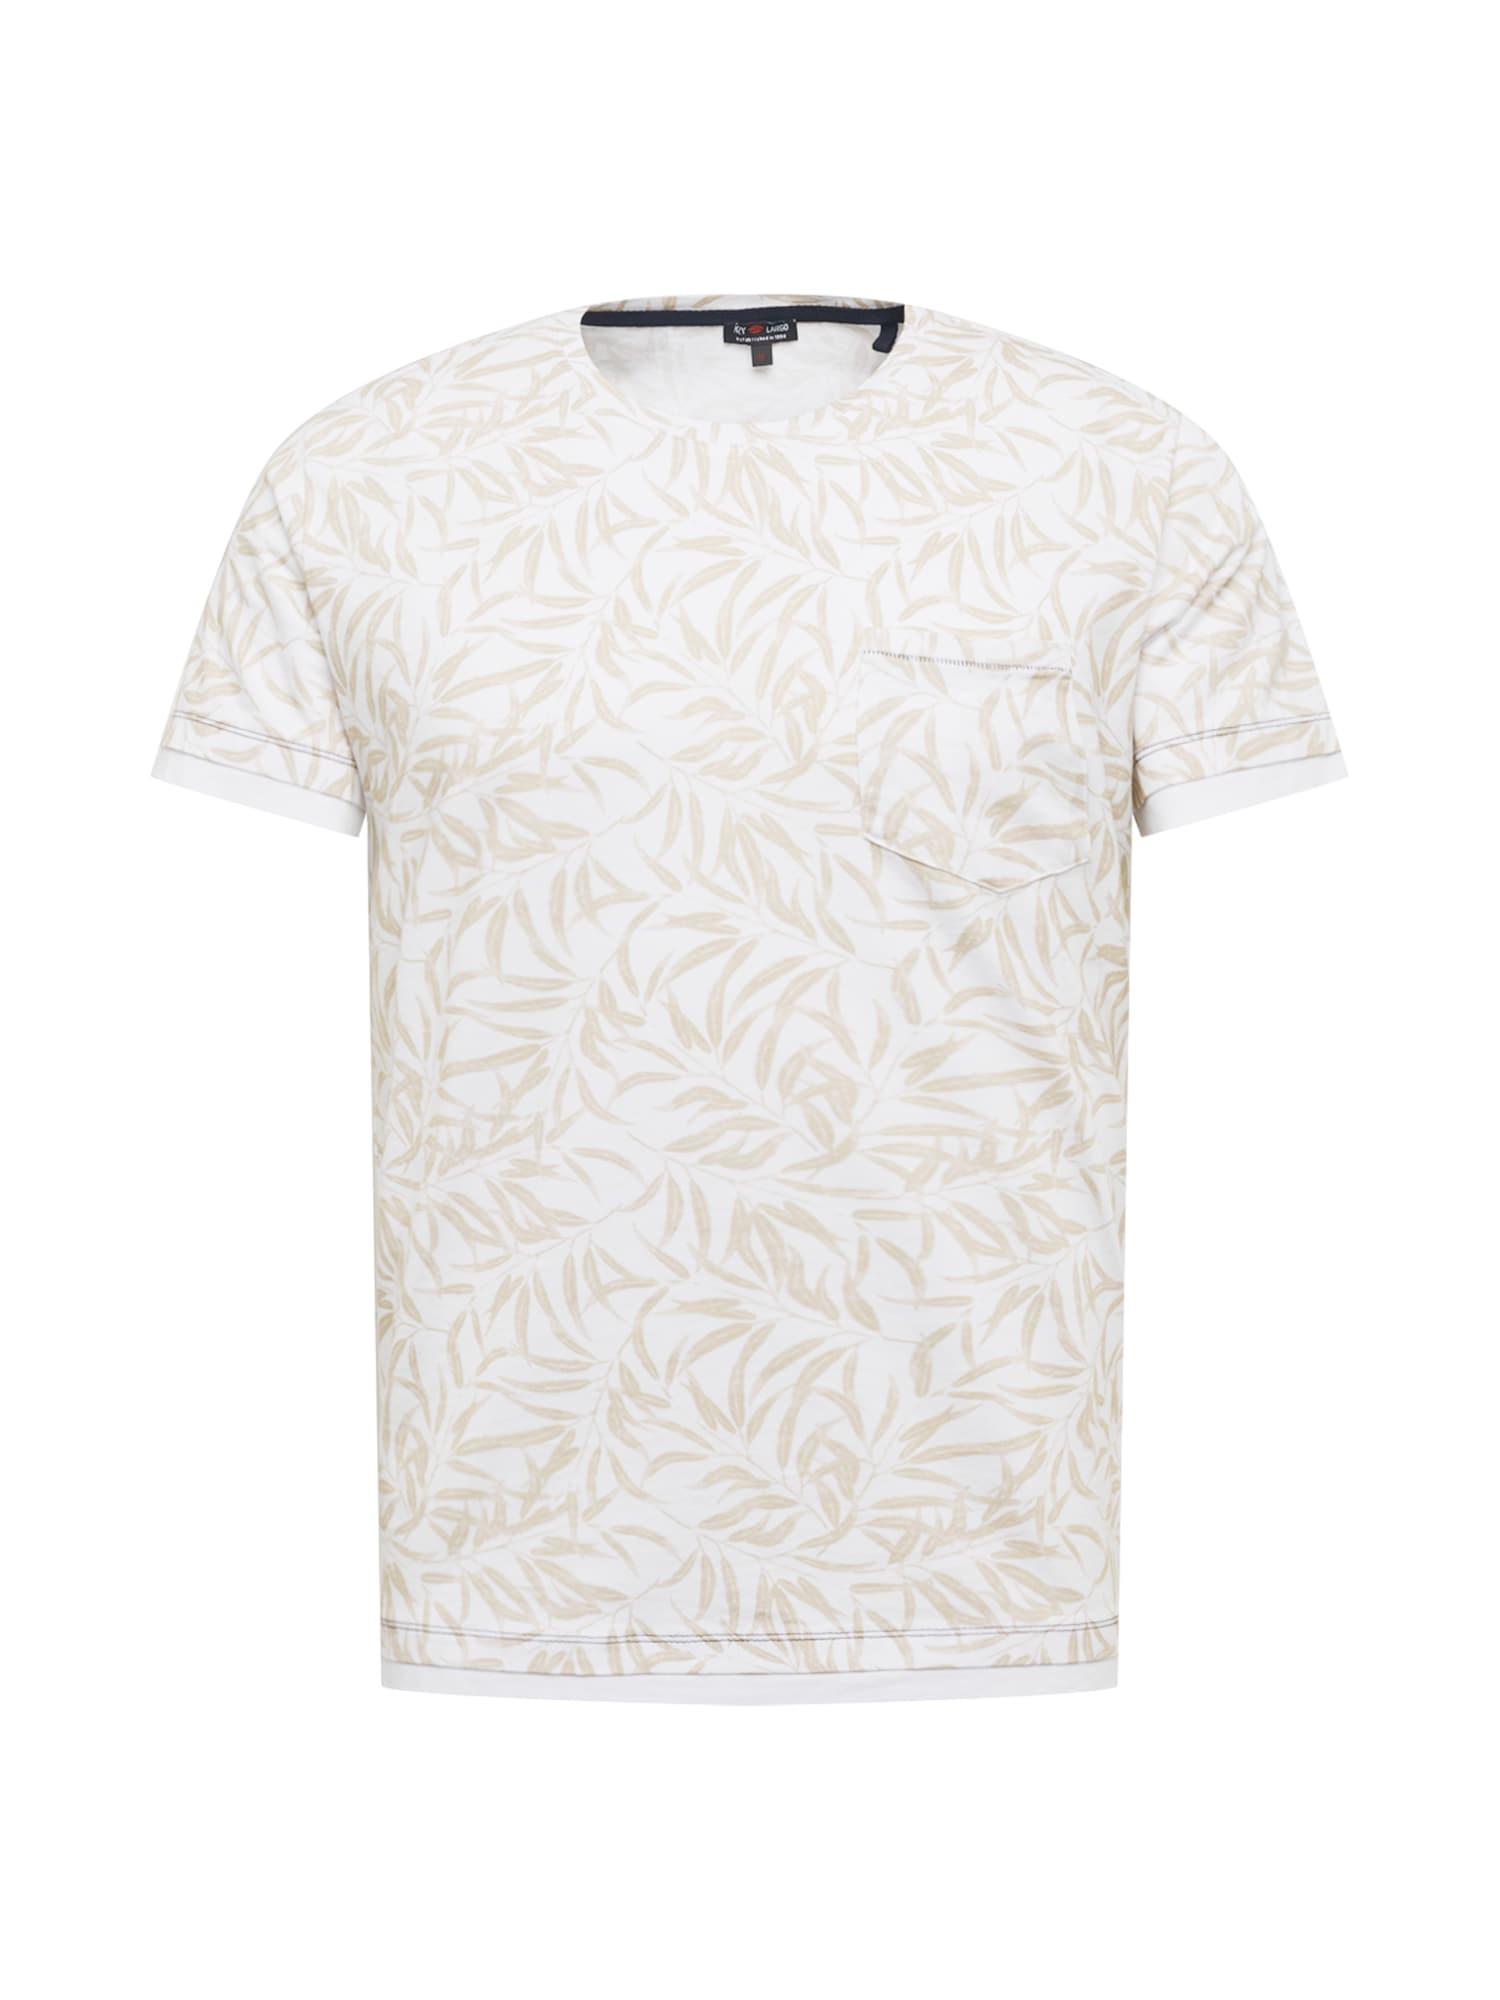 Key Largo T-Shirt 'LOCATION'  - Blanc - Taille: L - male